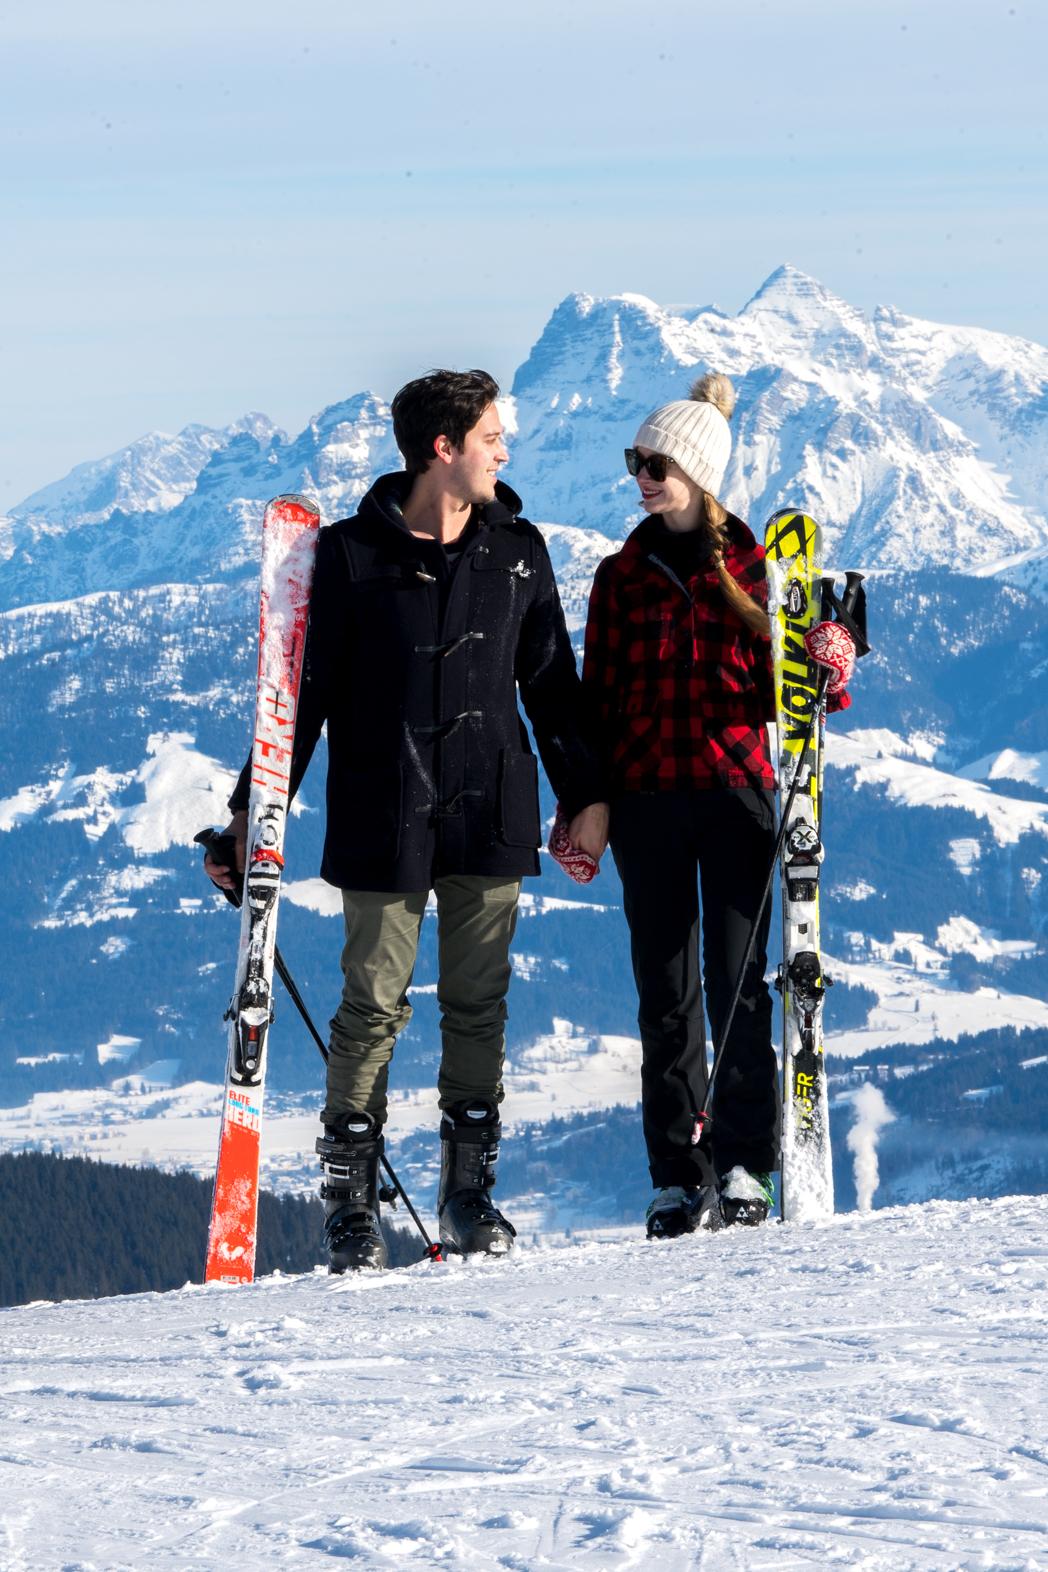 Stacie Flinner Christmas Ski Kitzbuhel Austria -27.jpg